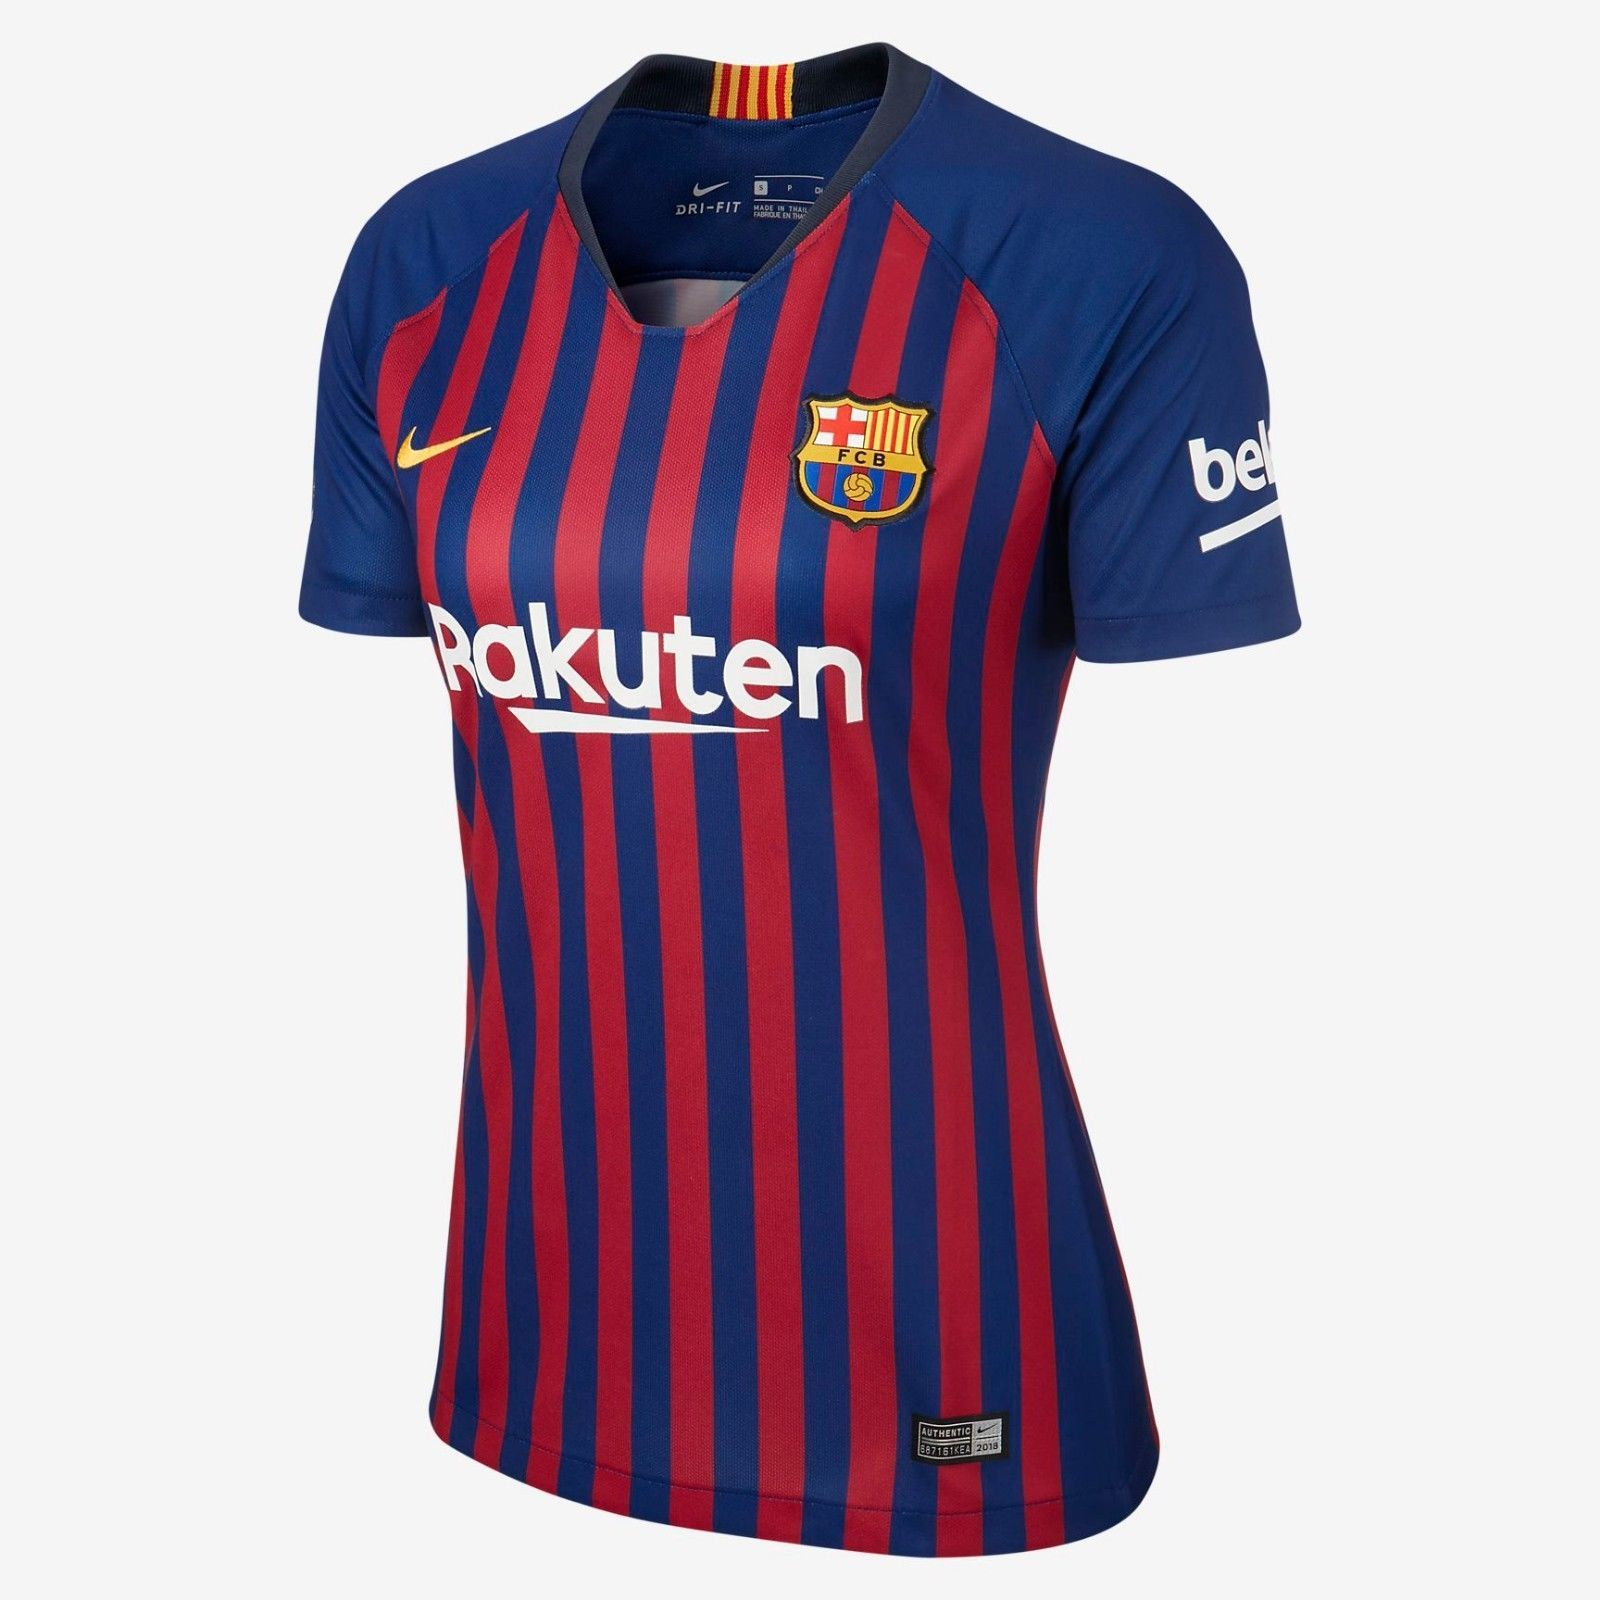 4cf79601e2b Nike Fc Barcelona Women s Home Jersey and 50 similar items. 57